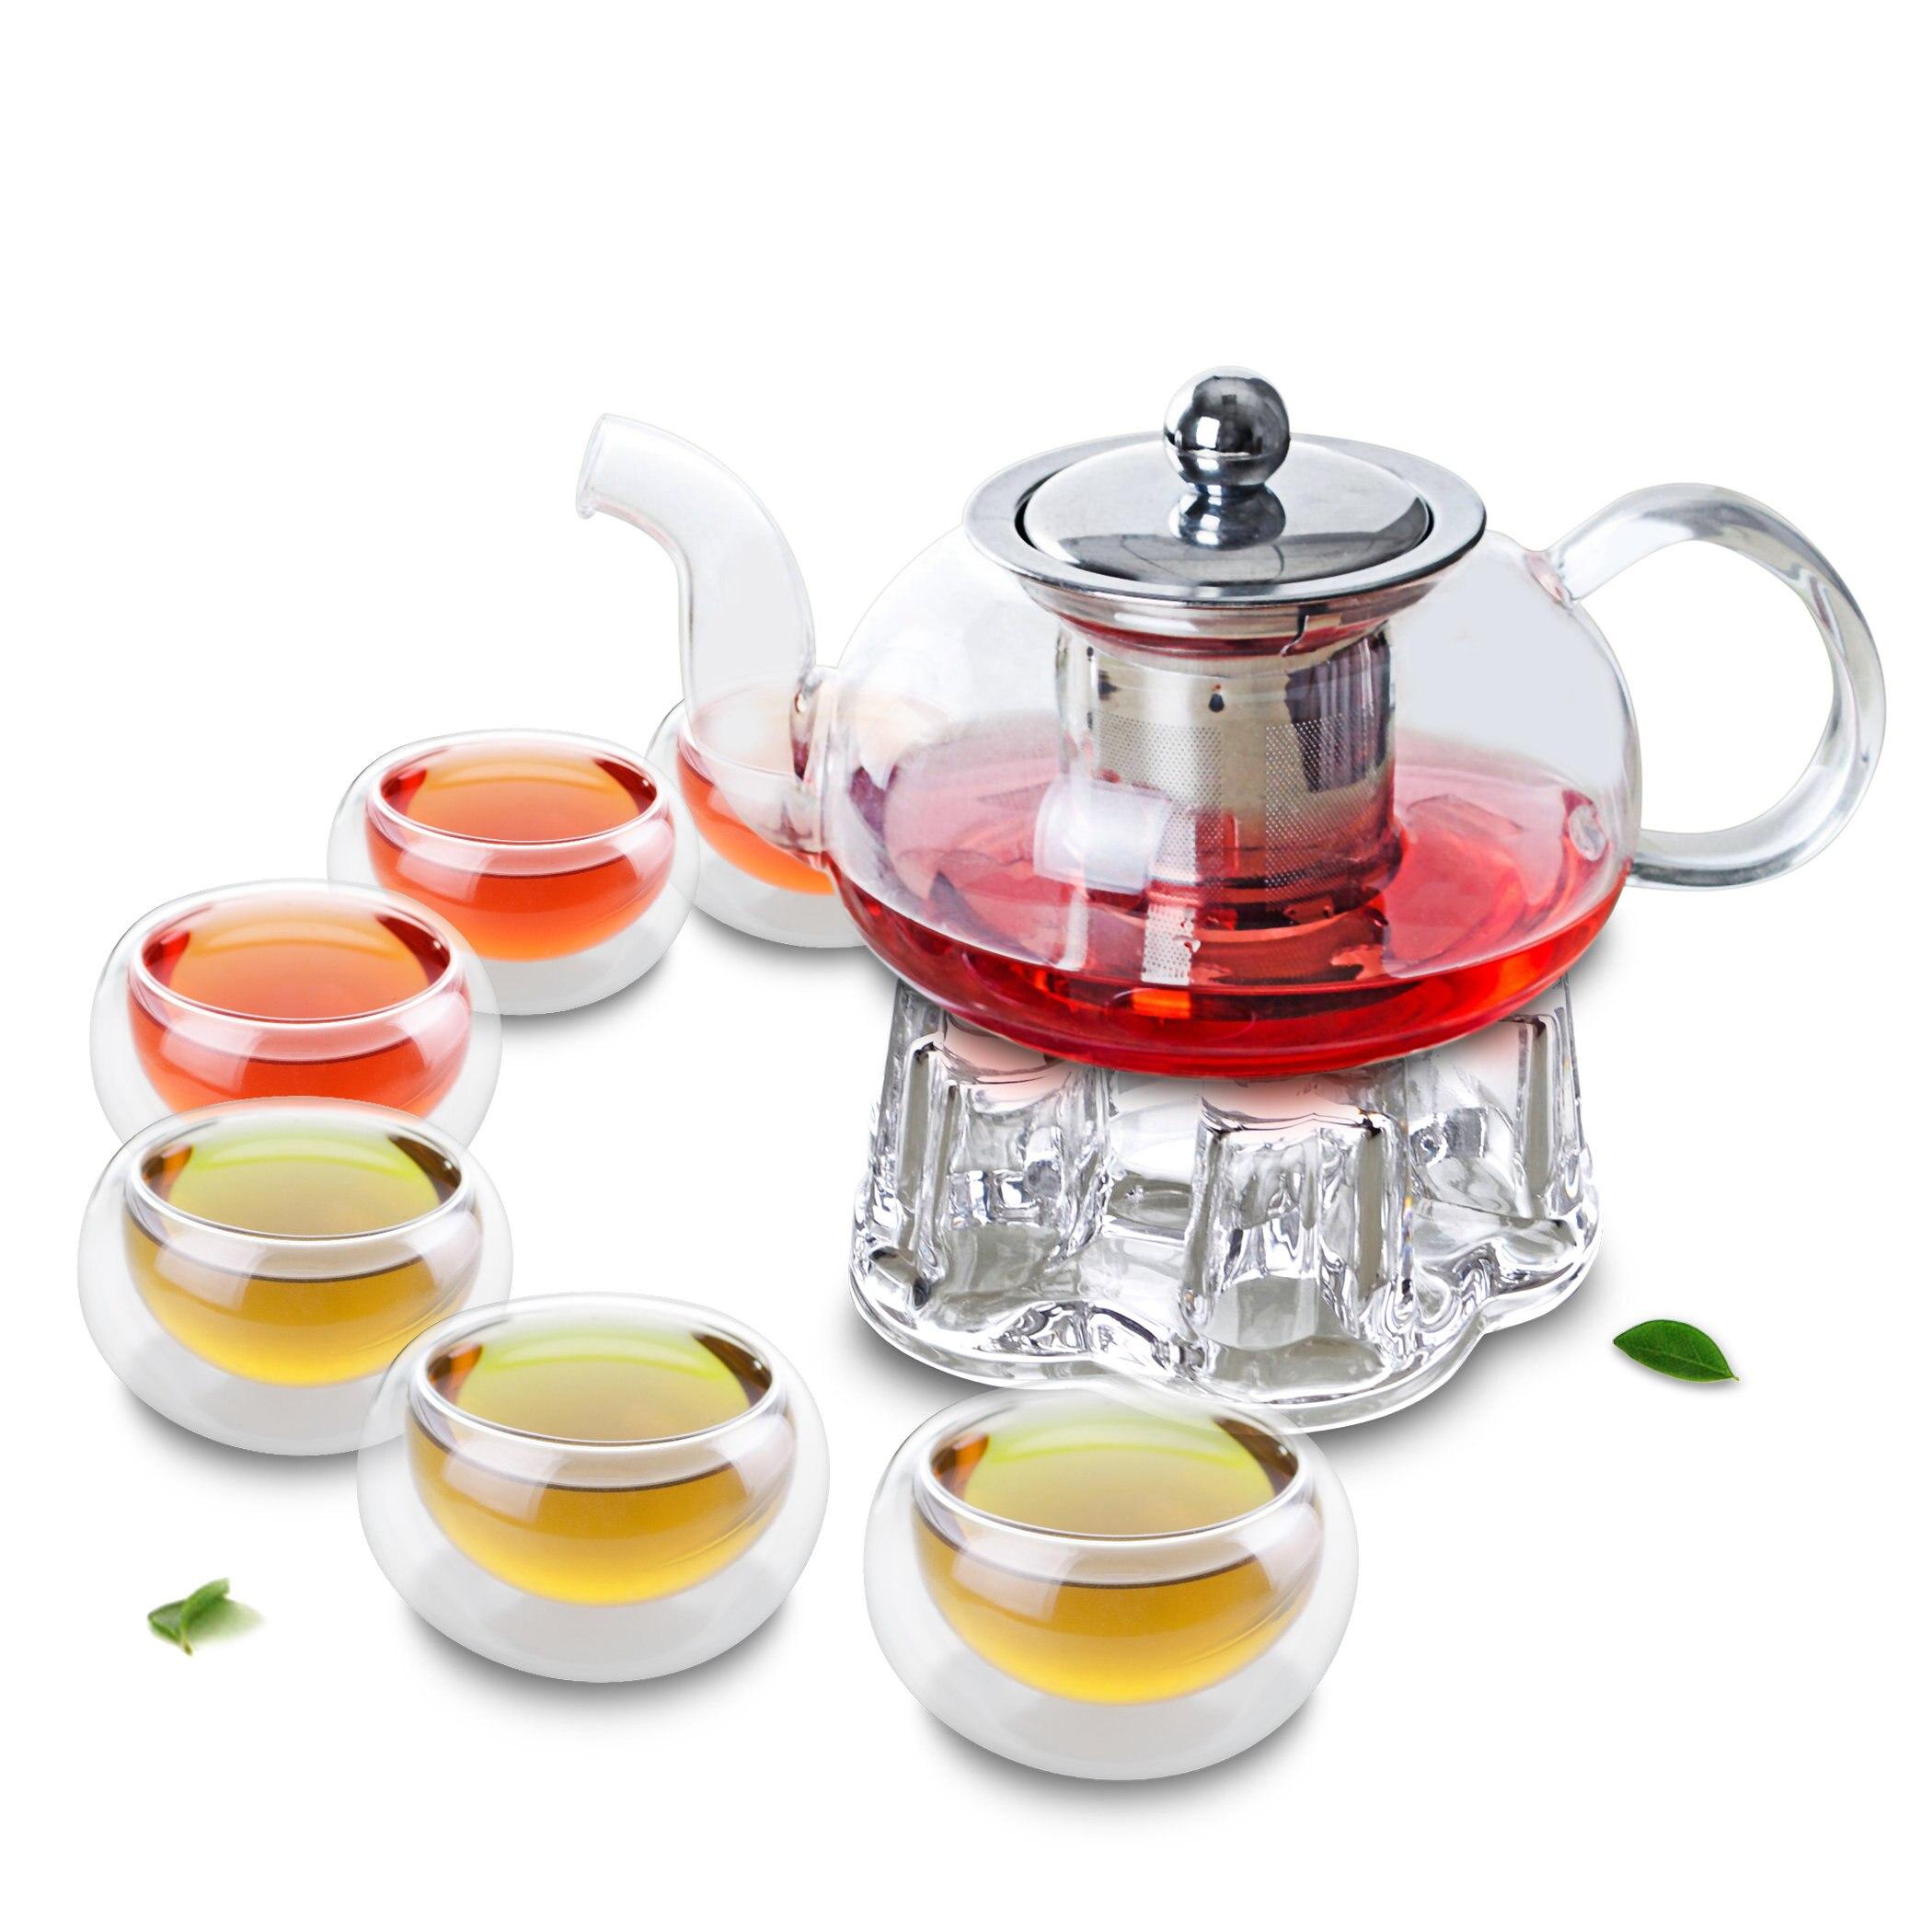 1x 8in1 الكونغ فو القهوة الشاي مجموعة B-625ml قصيرة منخفضة الزجاج الشاي وعاء ث/الفولاذ المقاوم للصدأ تصفية الكريستال دفئا 6 * جدار مزدوج طبقة كوب